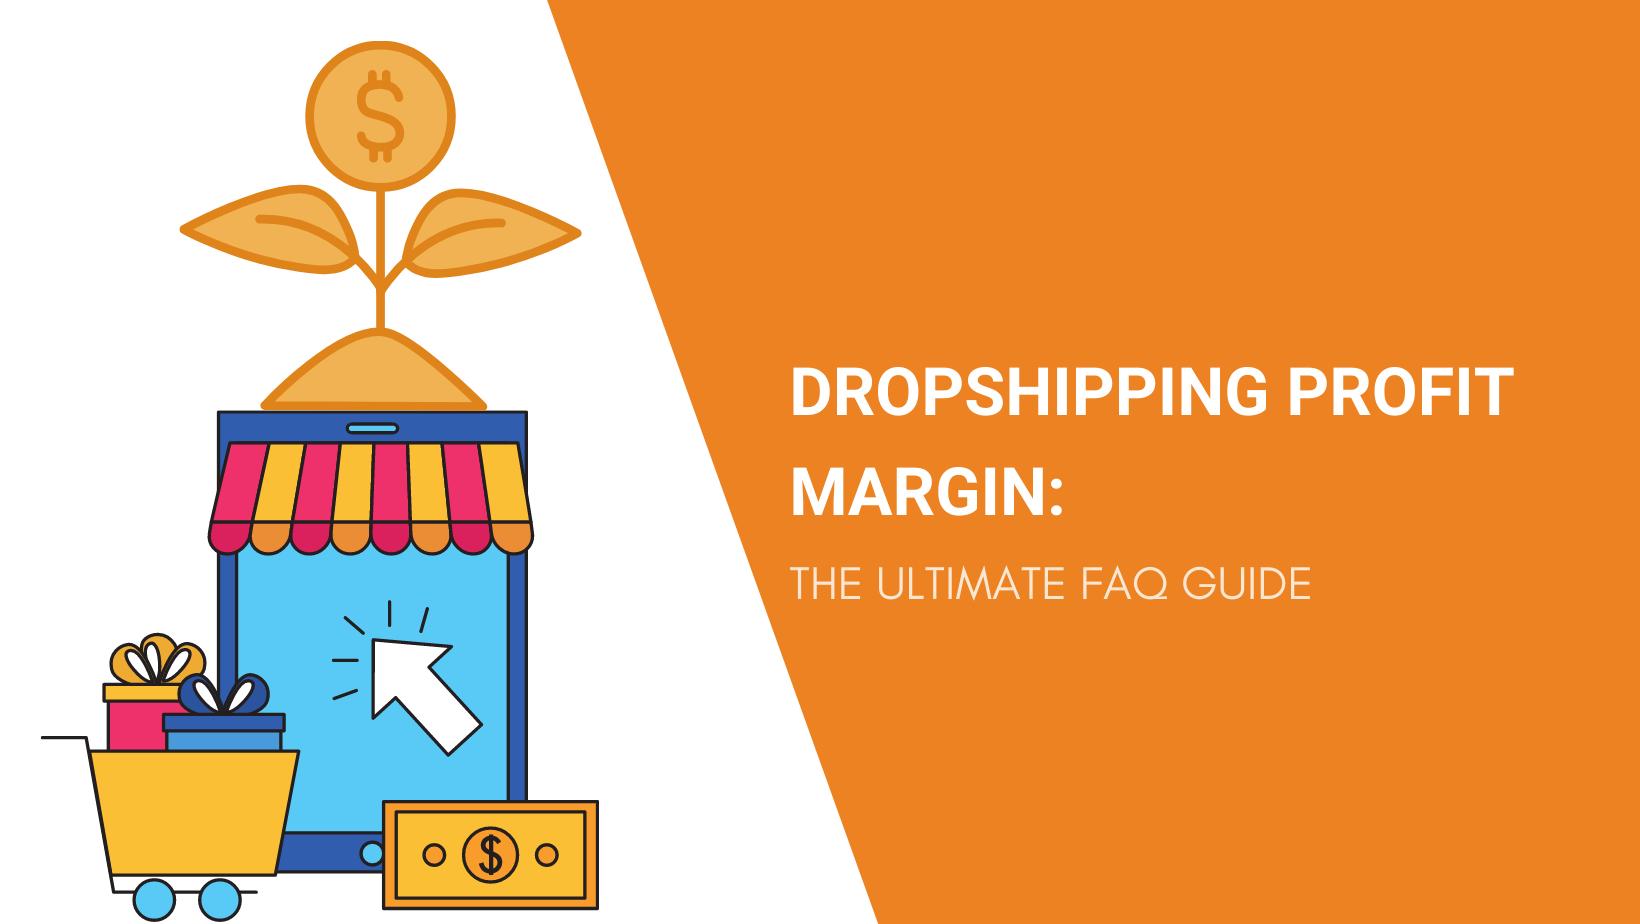 DROPSHIPPING PROFIT MARGIN THE ULTIMATE FAQ GUIDE